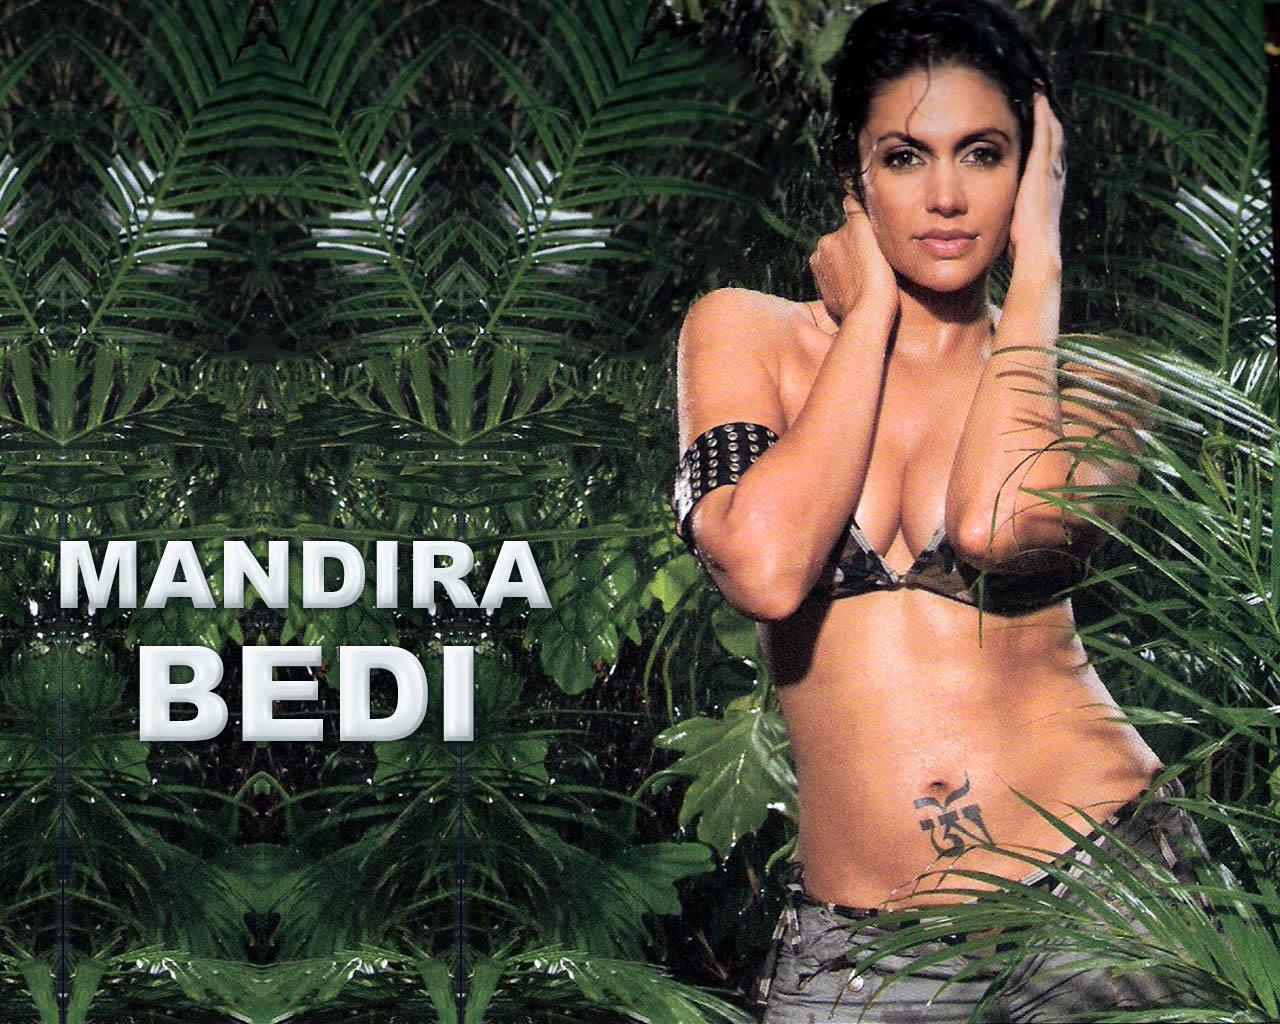 Mandira bedi sex free download